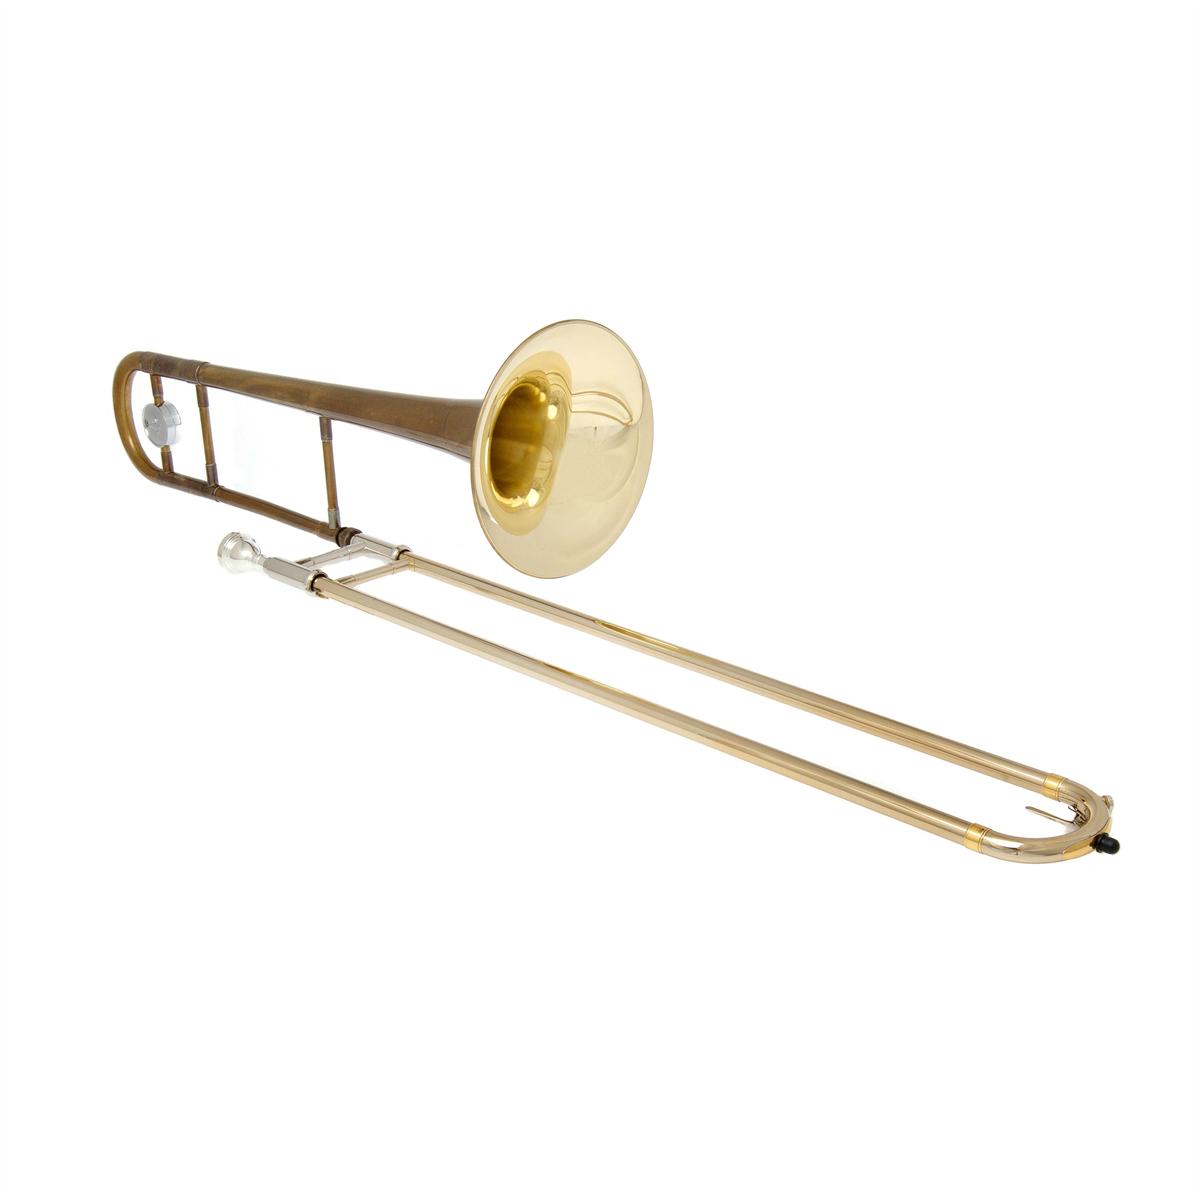 John Packer Tenor Trombone JP231RATHA - Uitvoering: Antique